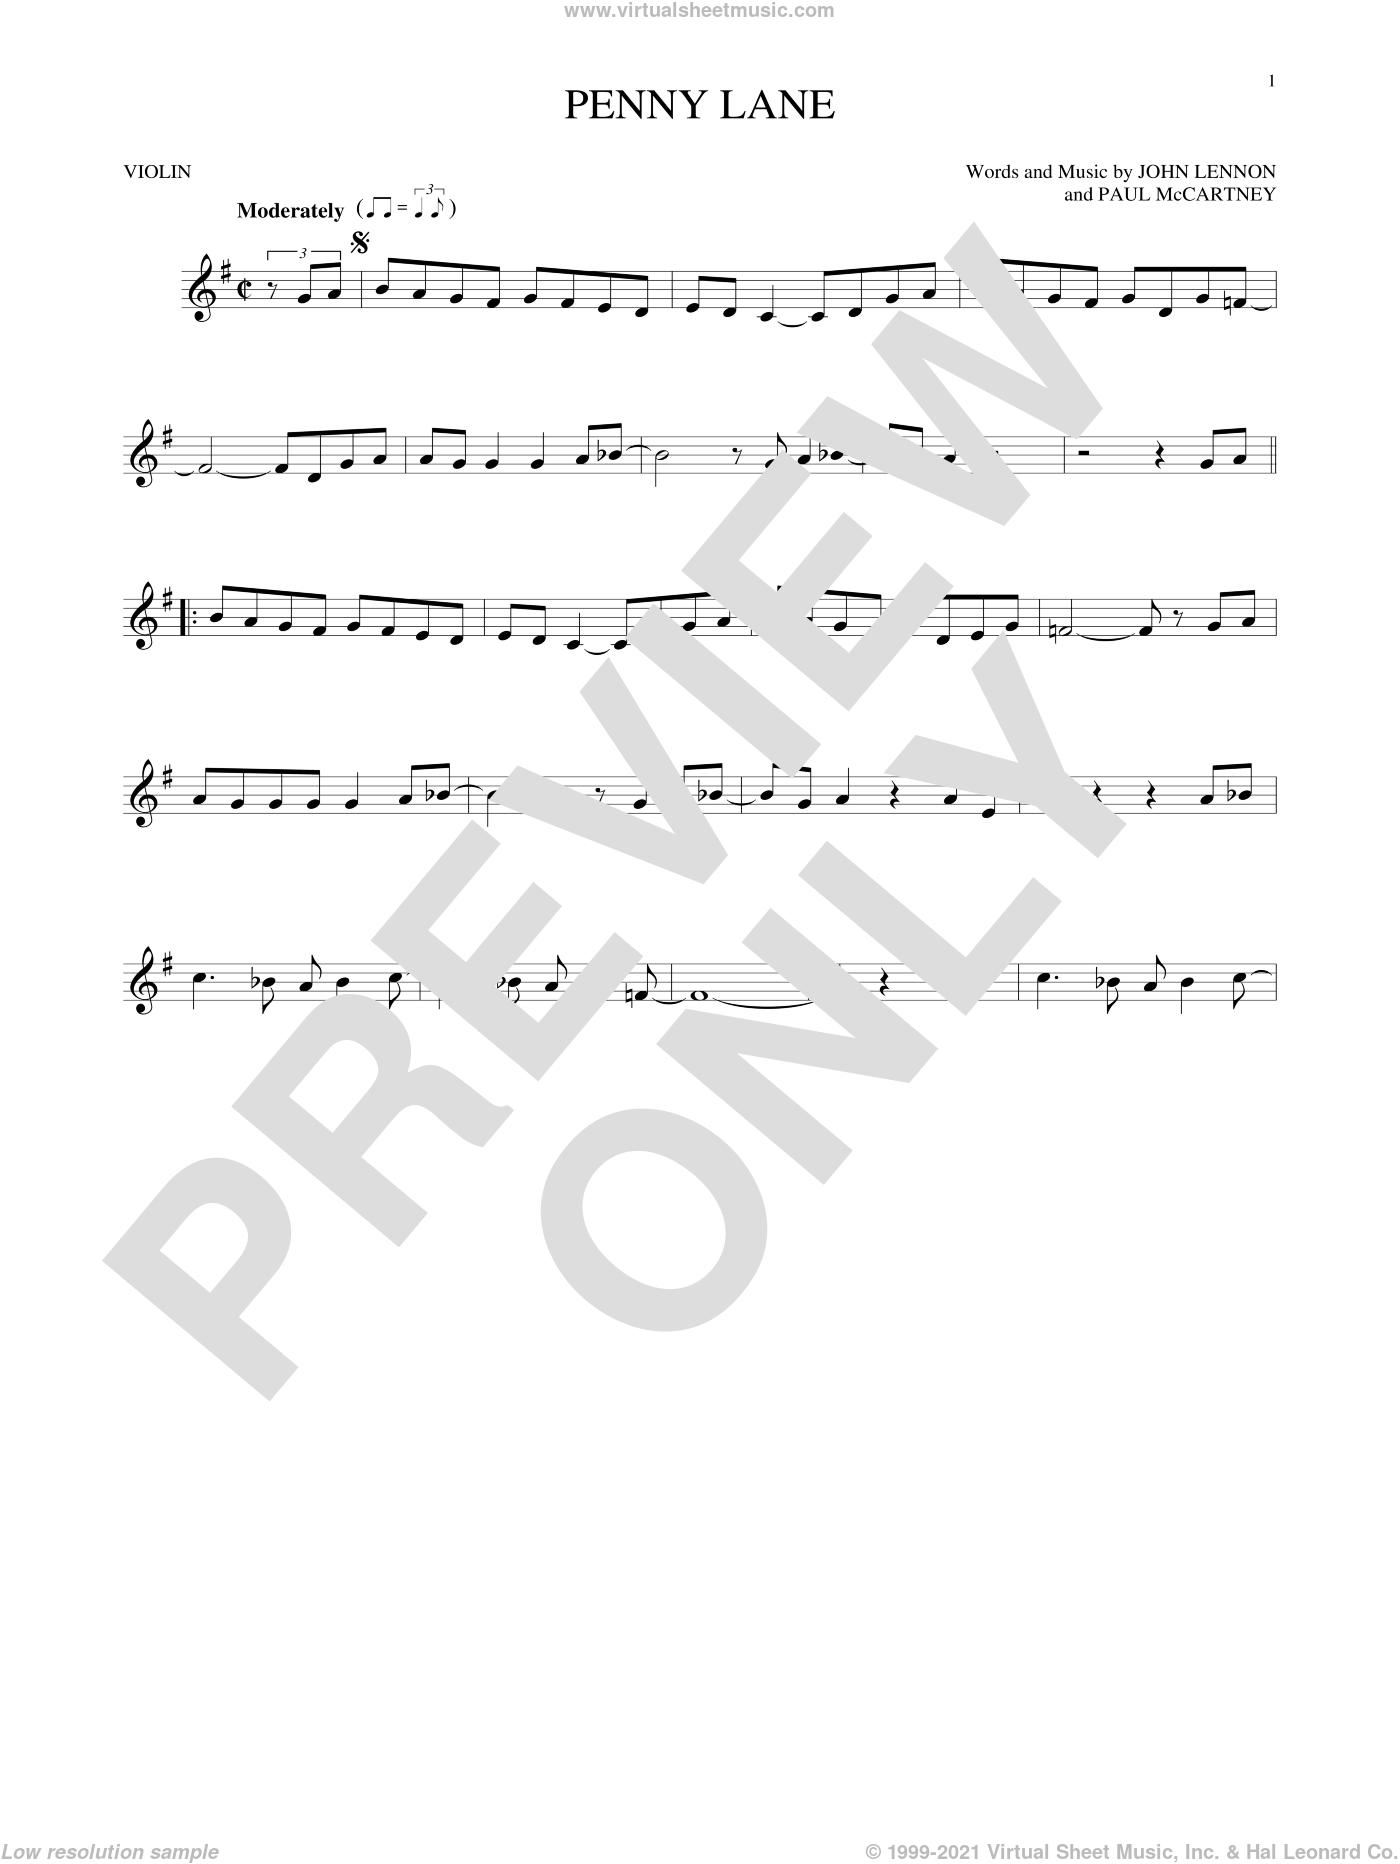 Penny Lane sheet music for violin solo by The Beatles, John Lennon and Paul McCartney, intermediate skill level